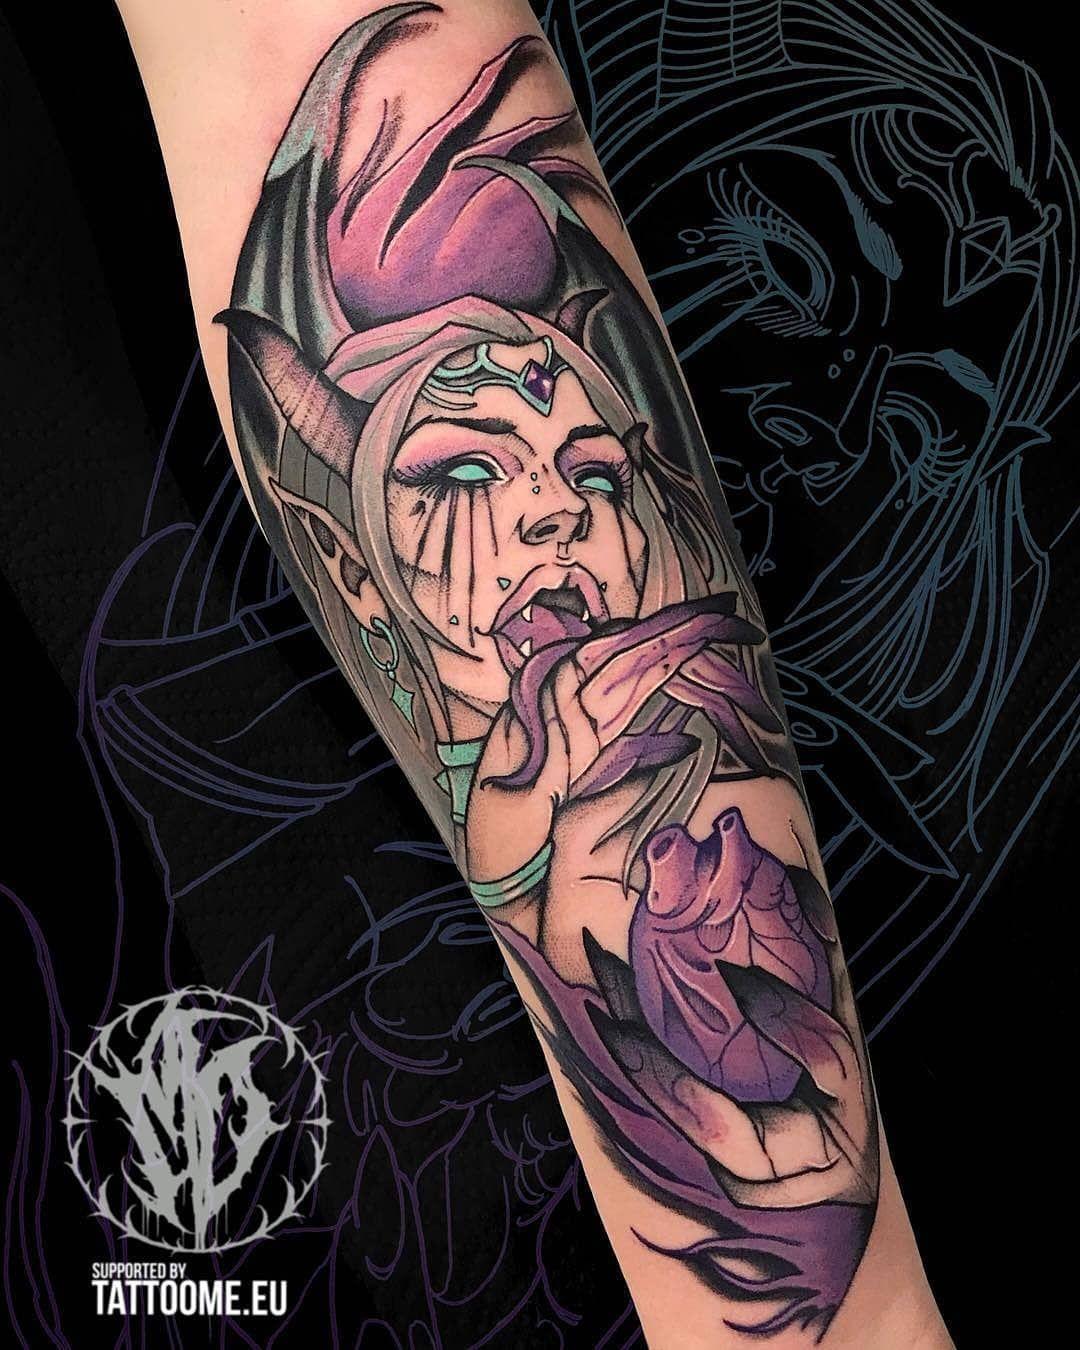 Anime Tattoos 107k On Instagram Succubus By Mattdattardi Follow Animemasterink For More Turn On Notif Zombie Girl Tattoos Tattoos Demon Tattoo